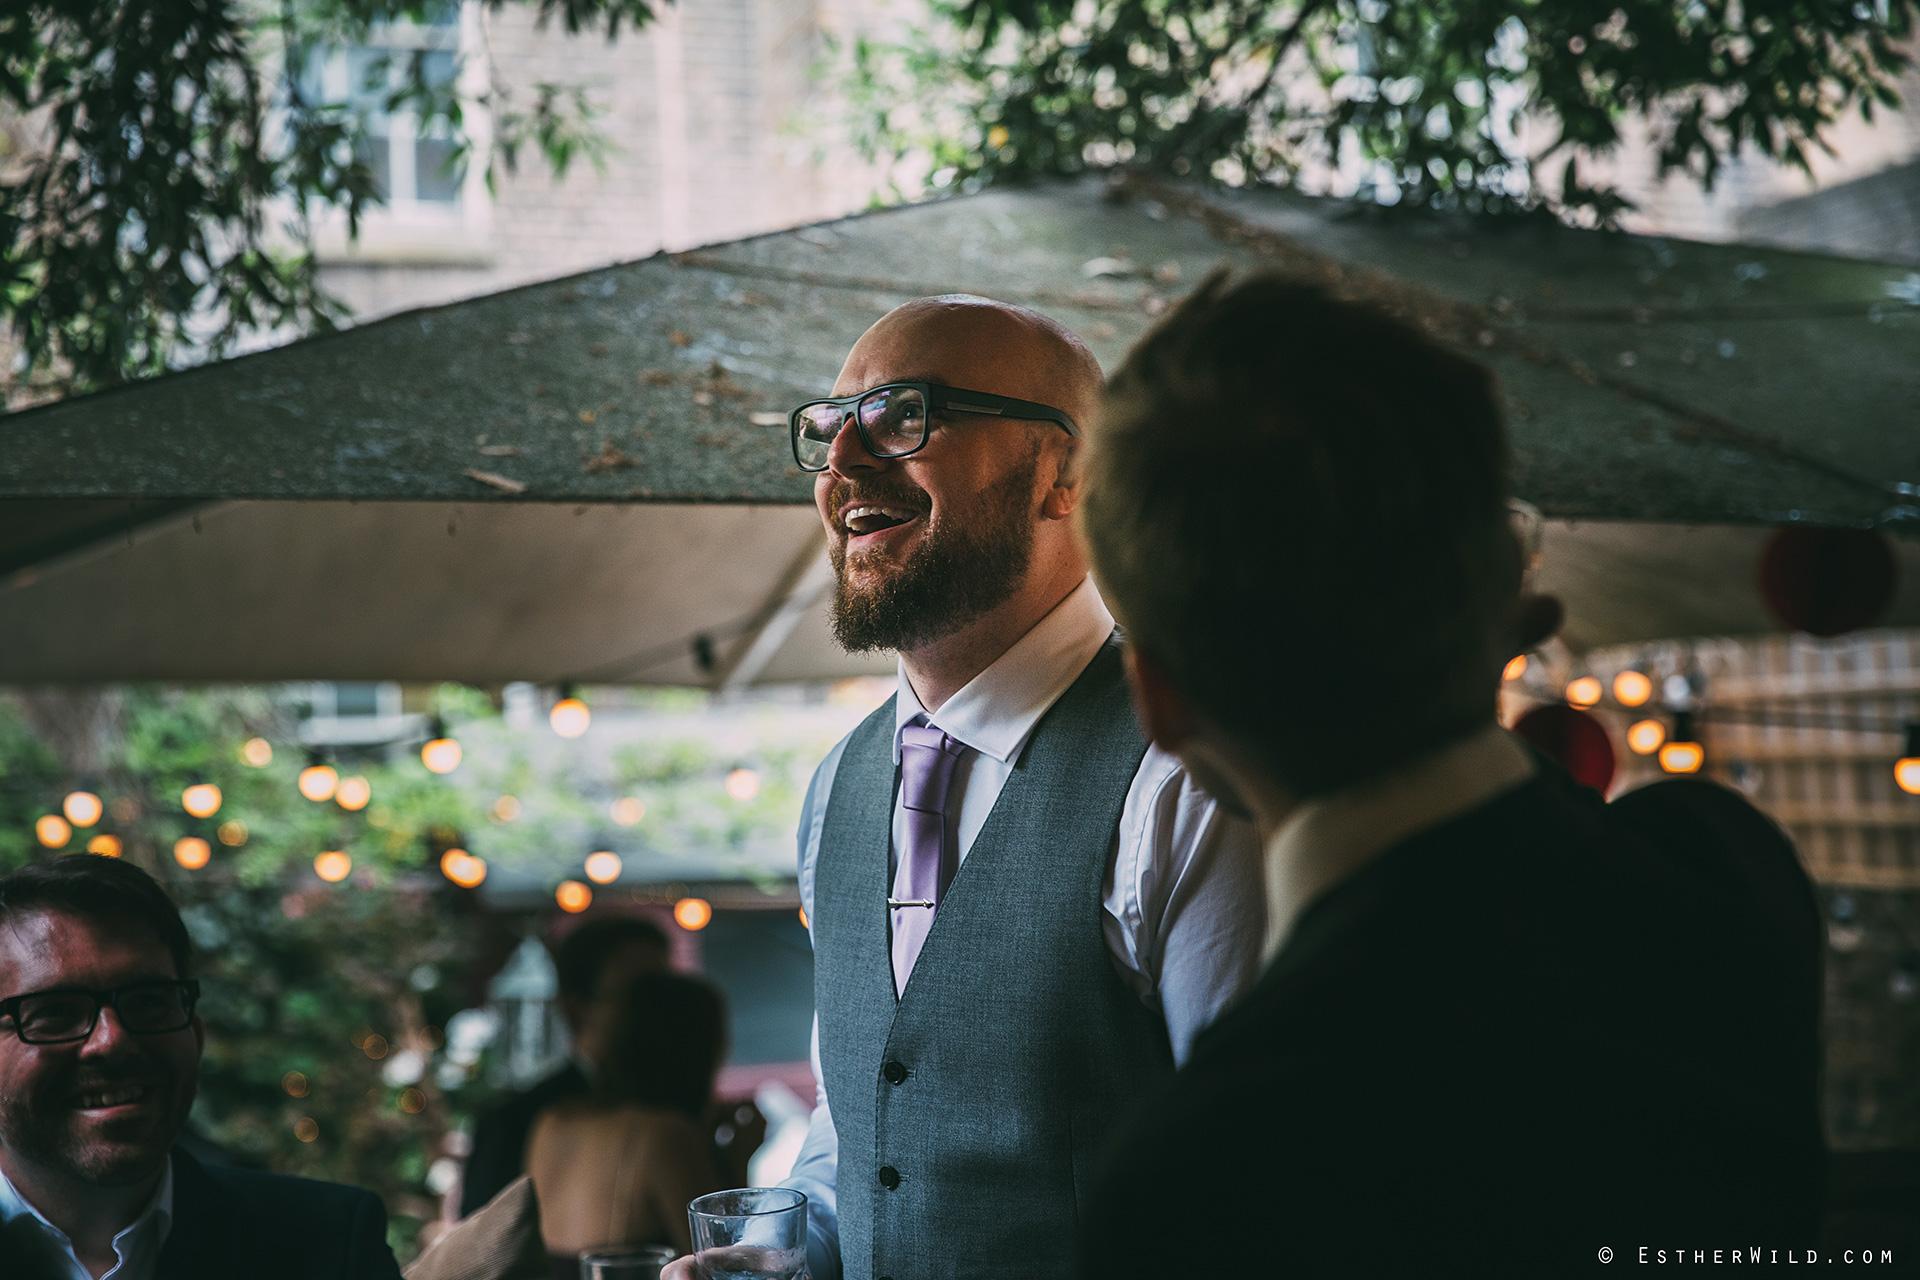 0617_London_Croydon_Clapham_Wedding_Photographer_Esther_Wild_Photography_IMG_6205.jpg